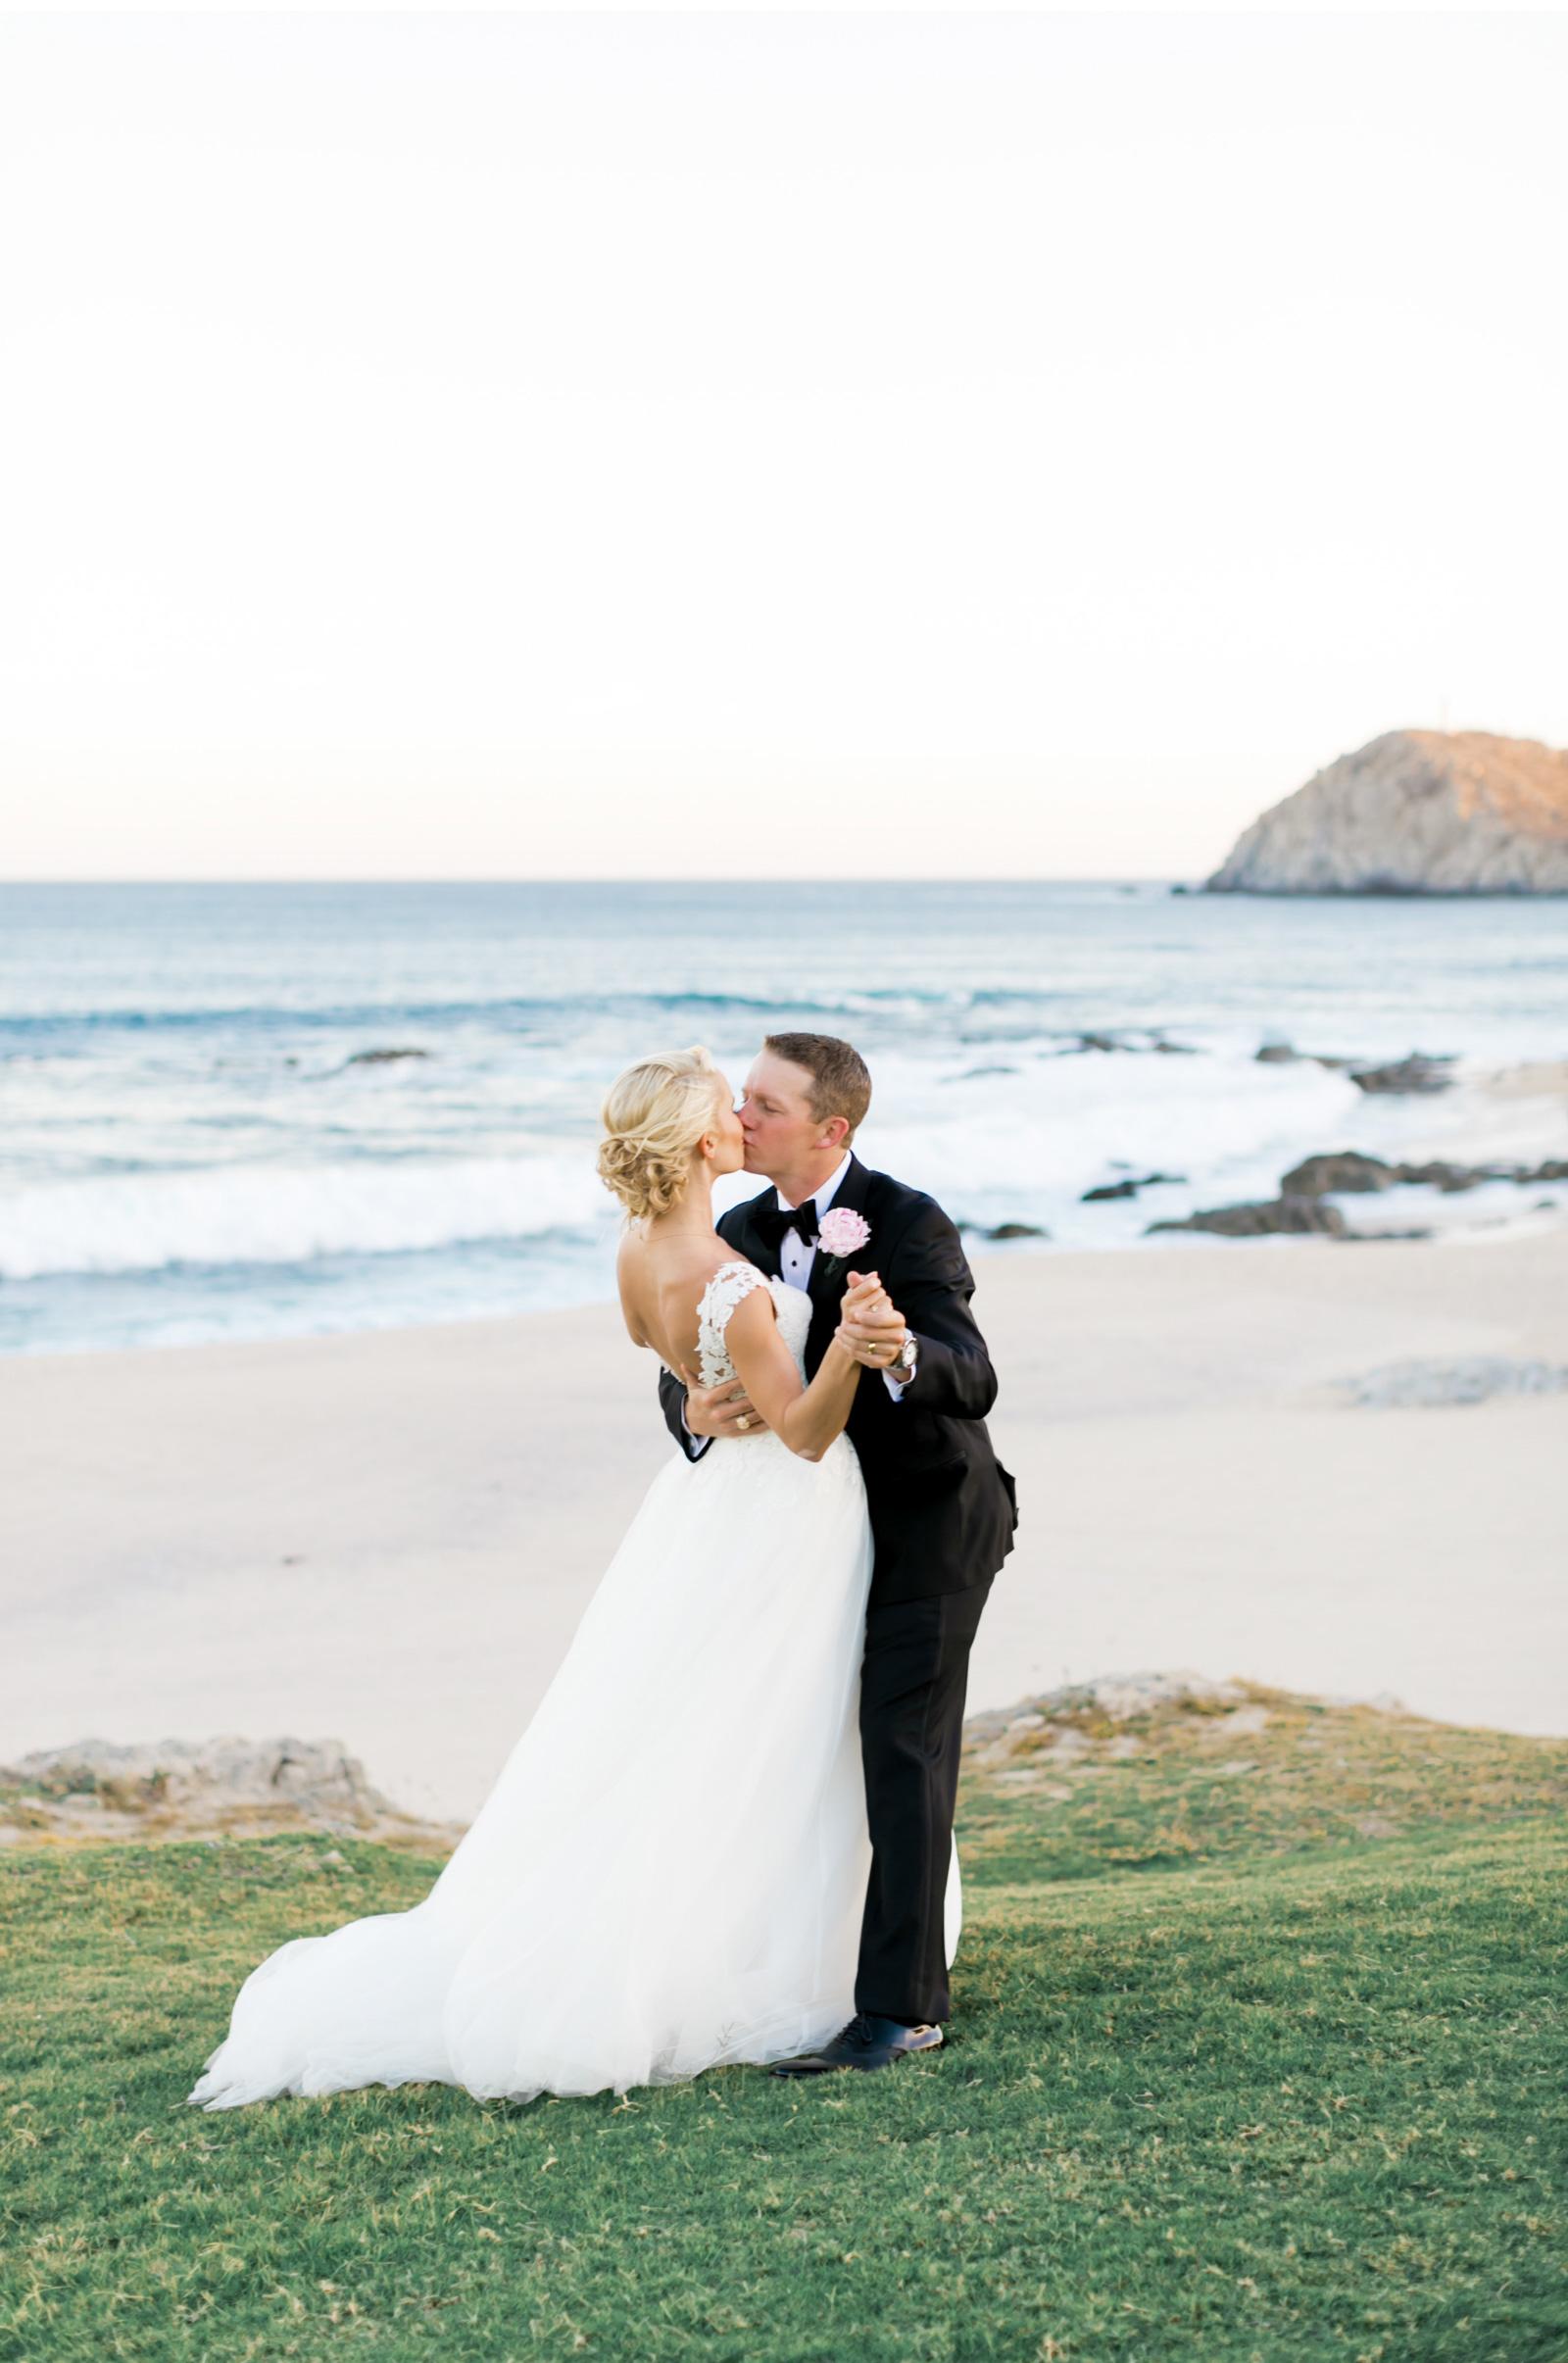 Hawaii-Destination-Wedding-Natalie-Schutt-Photography-Style-Me-Pretty_09.jpg